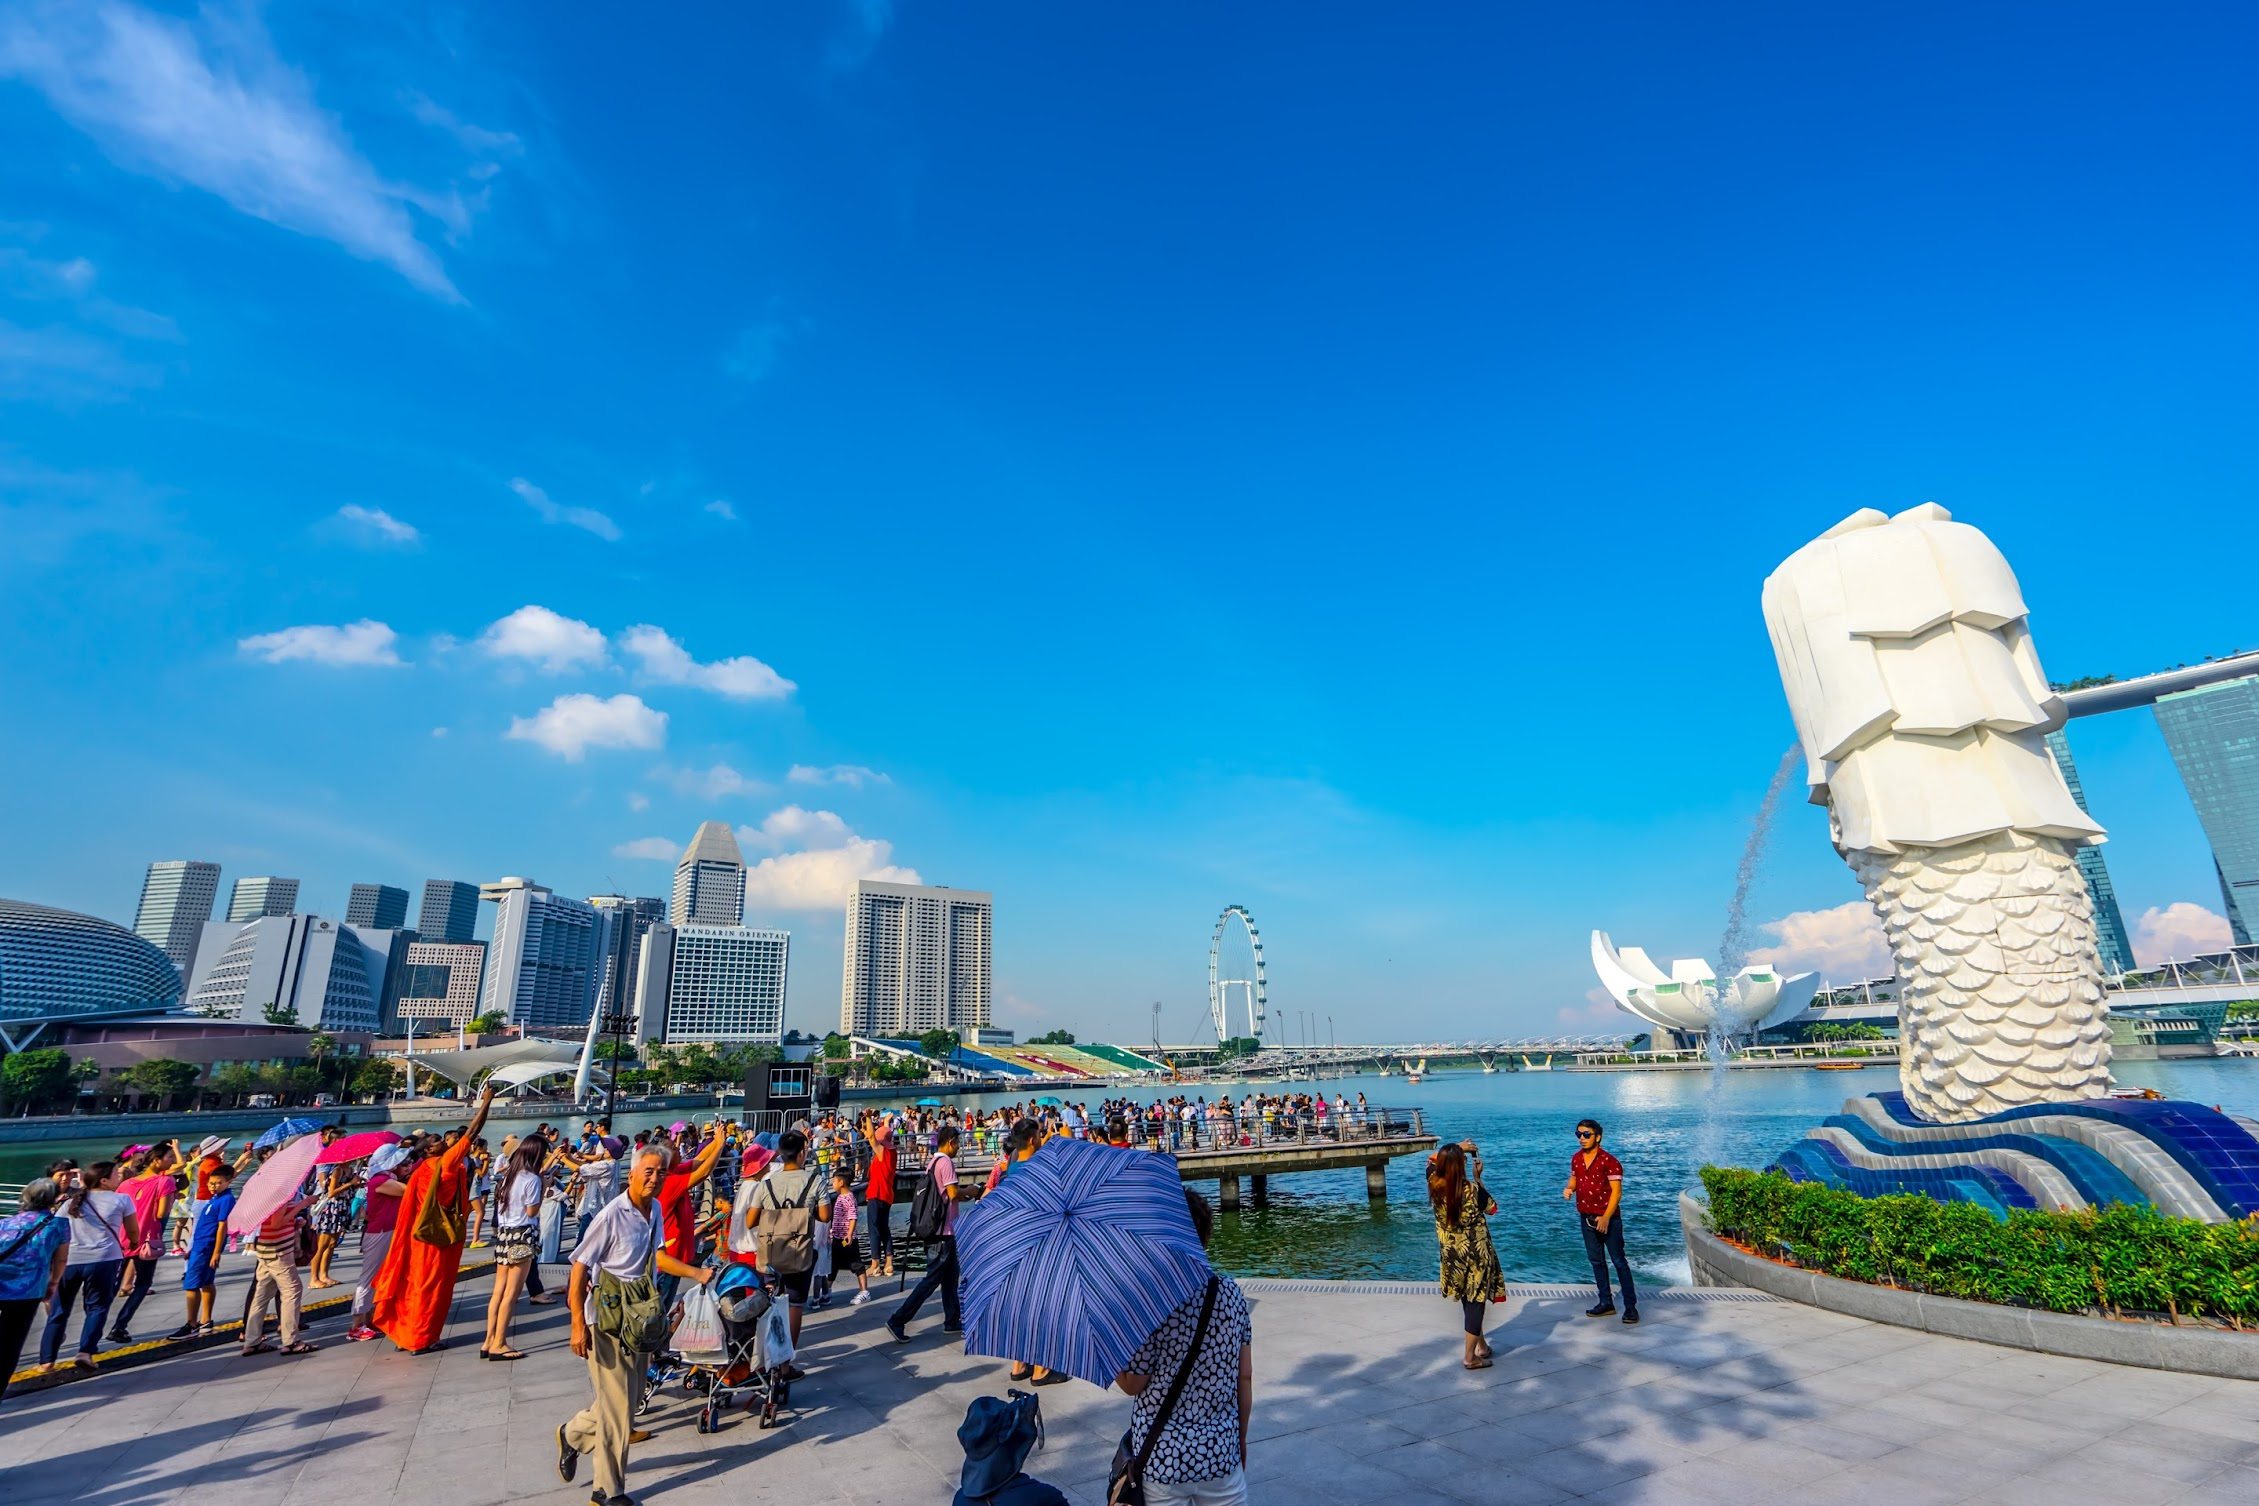 Singapore Merlion Park1